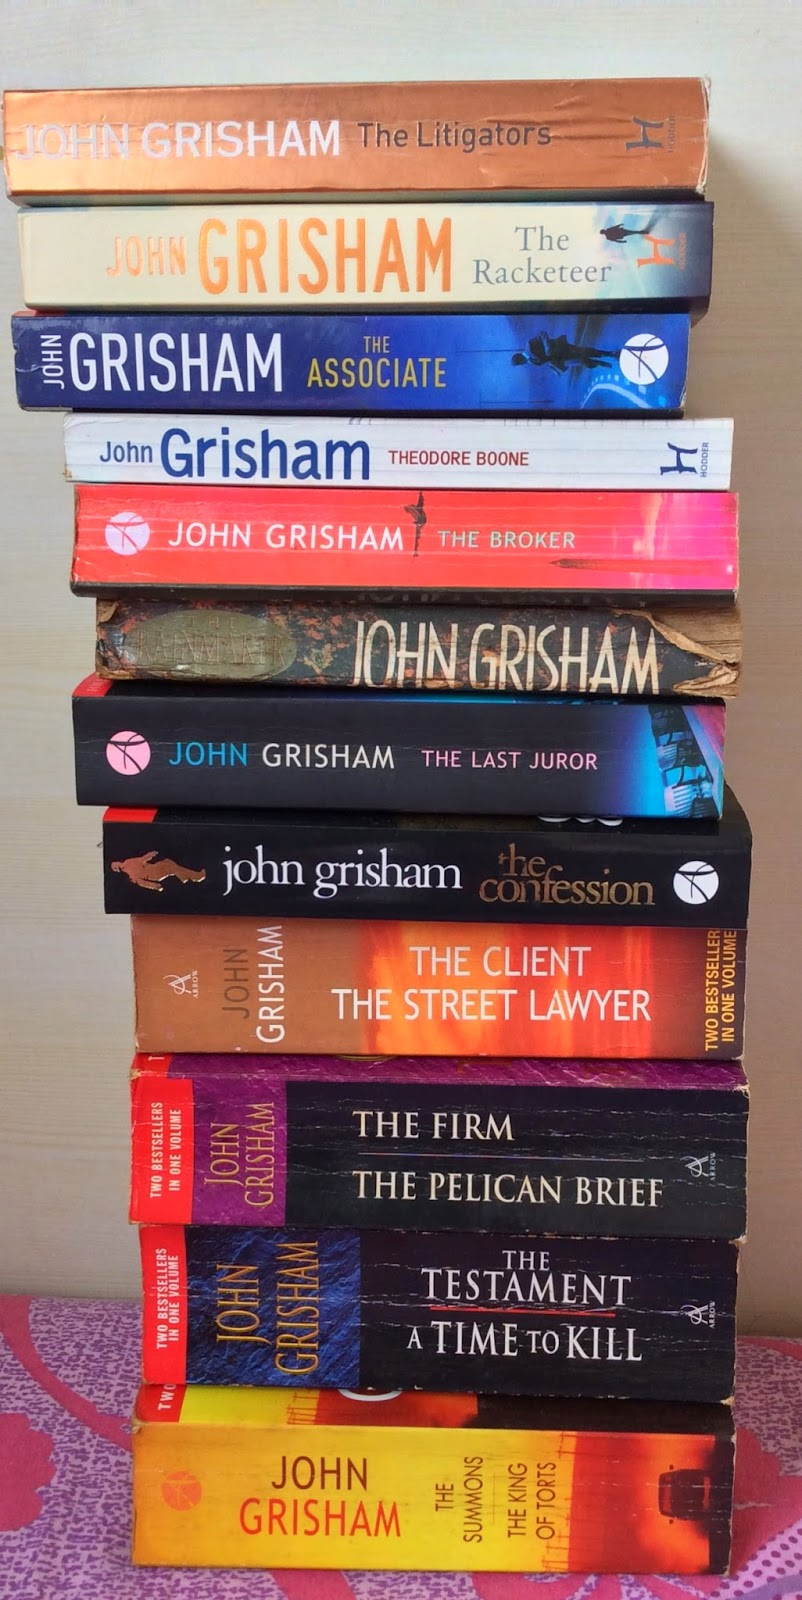 Courtroom drama books - John Grisham